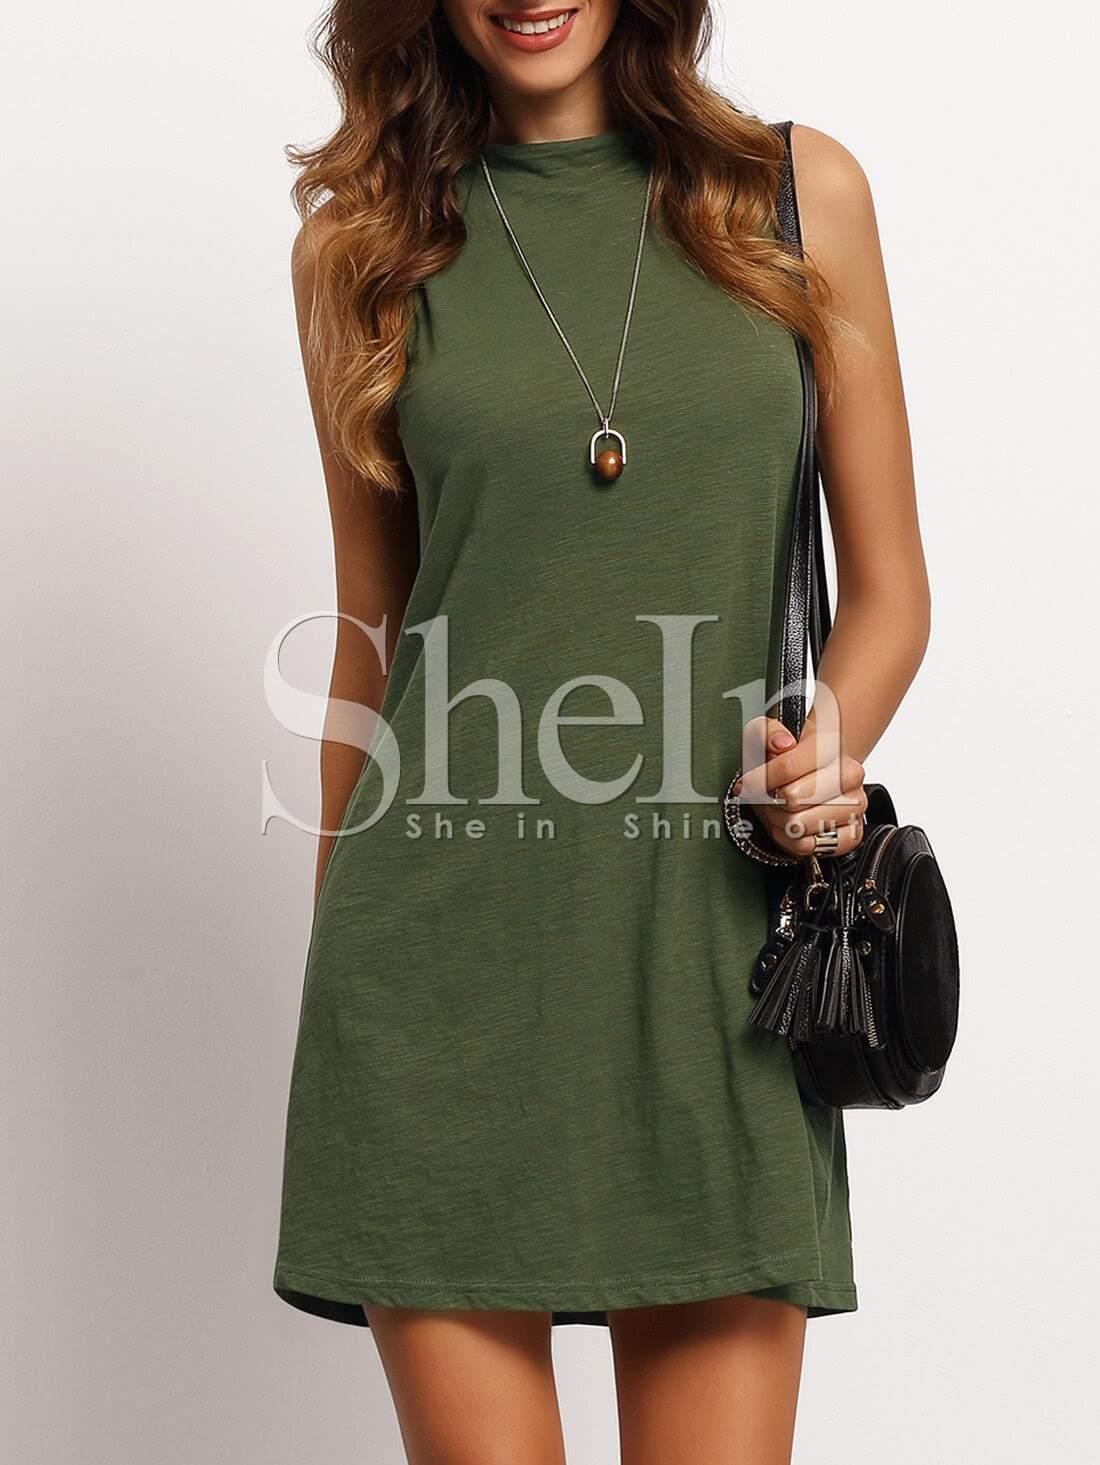 Blackish Green Mock Neck Sleeveless T-shirt Dress dress160310705